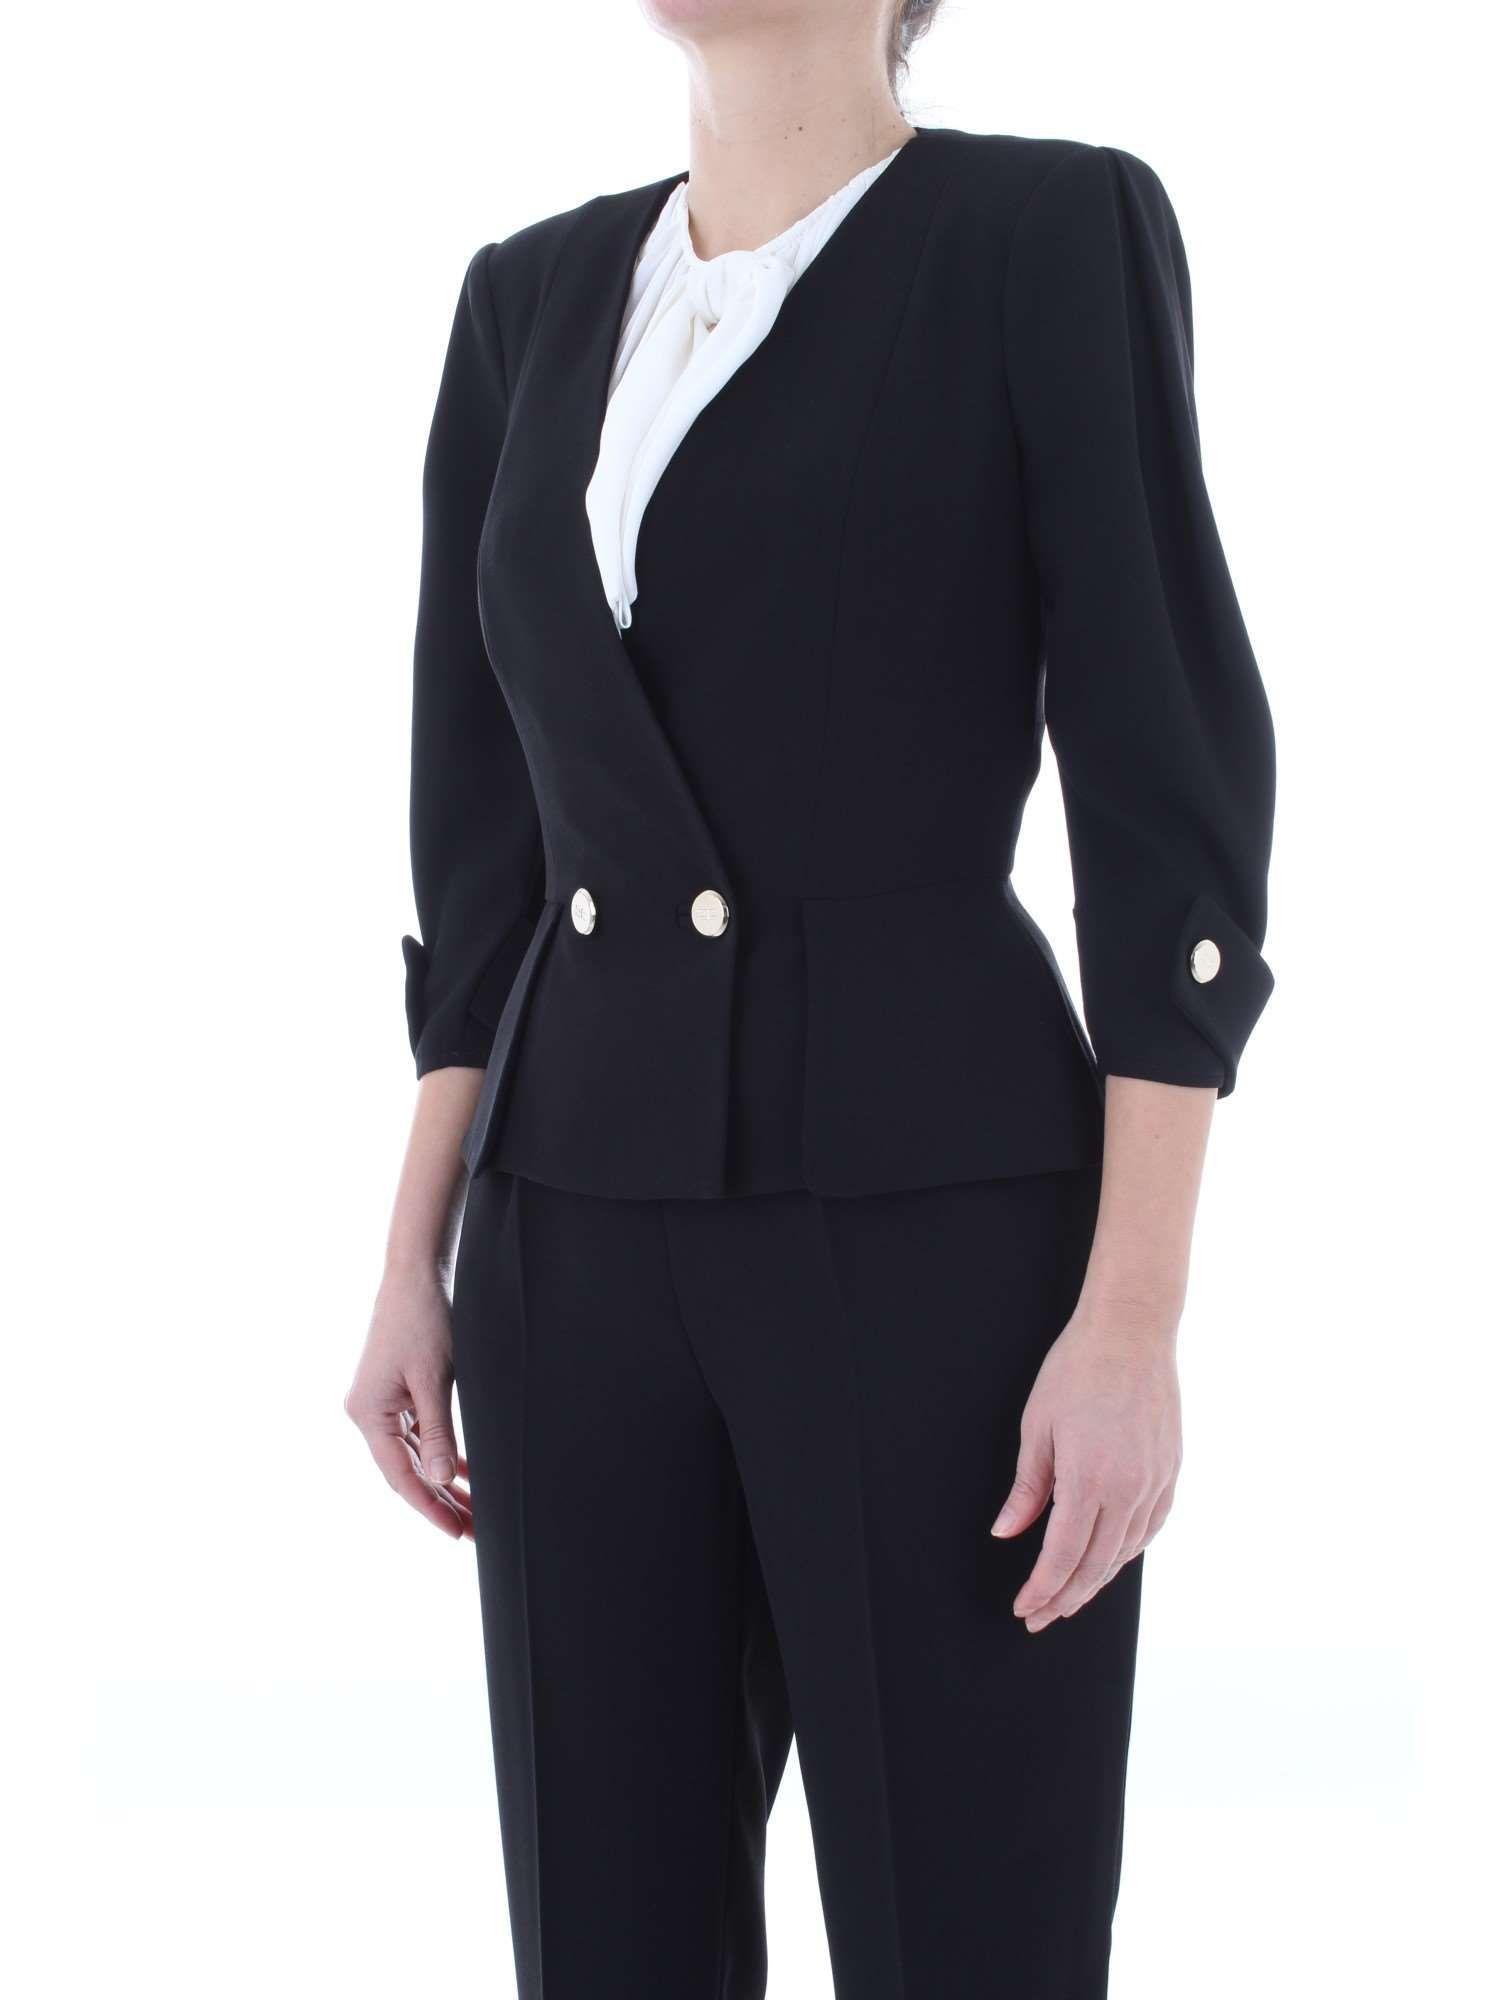 ELISABETTA FRANCHI WOMEN'S GI12591E2110 BLACK POLYESTER BLAZER